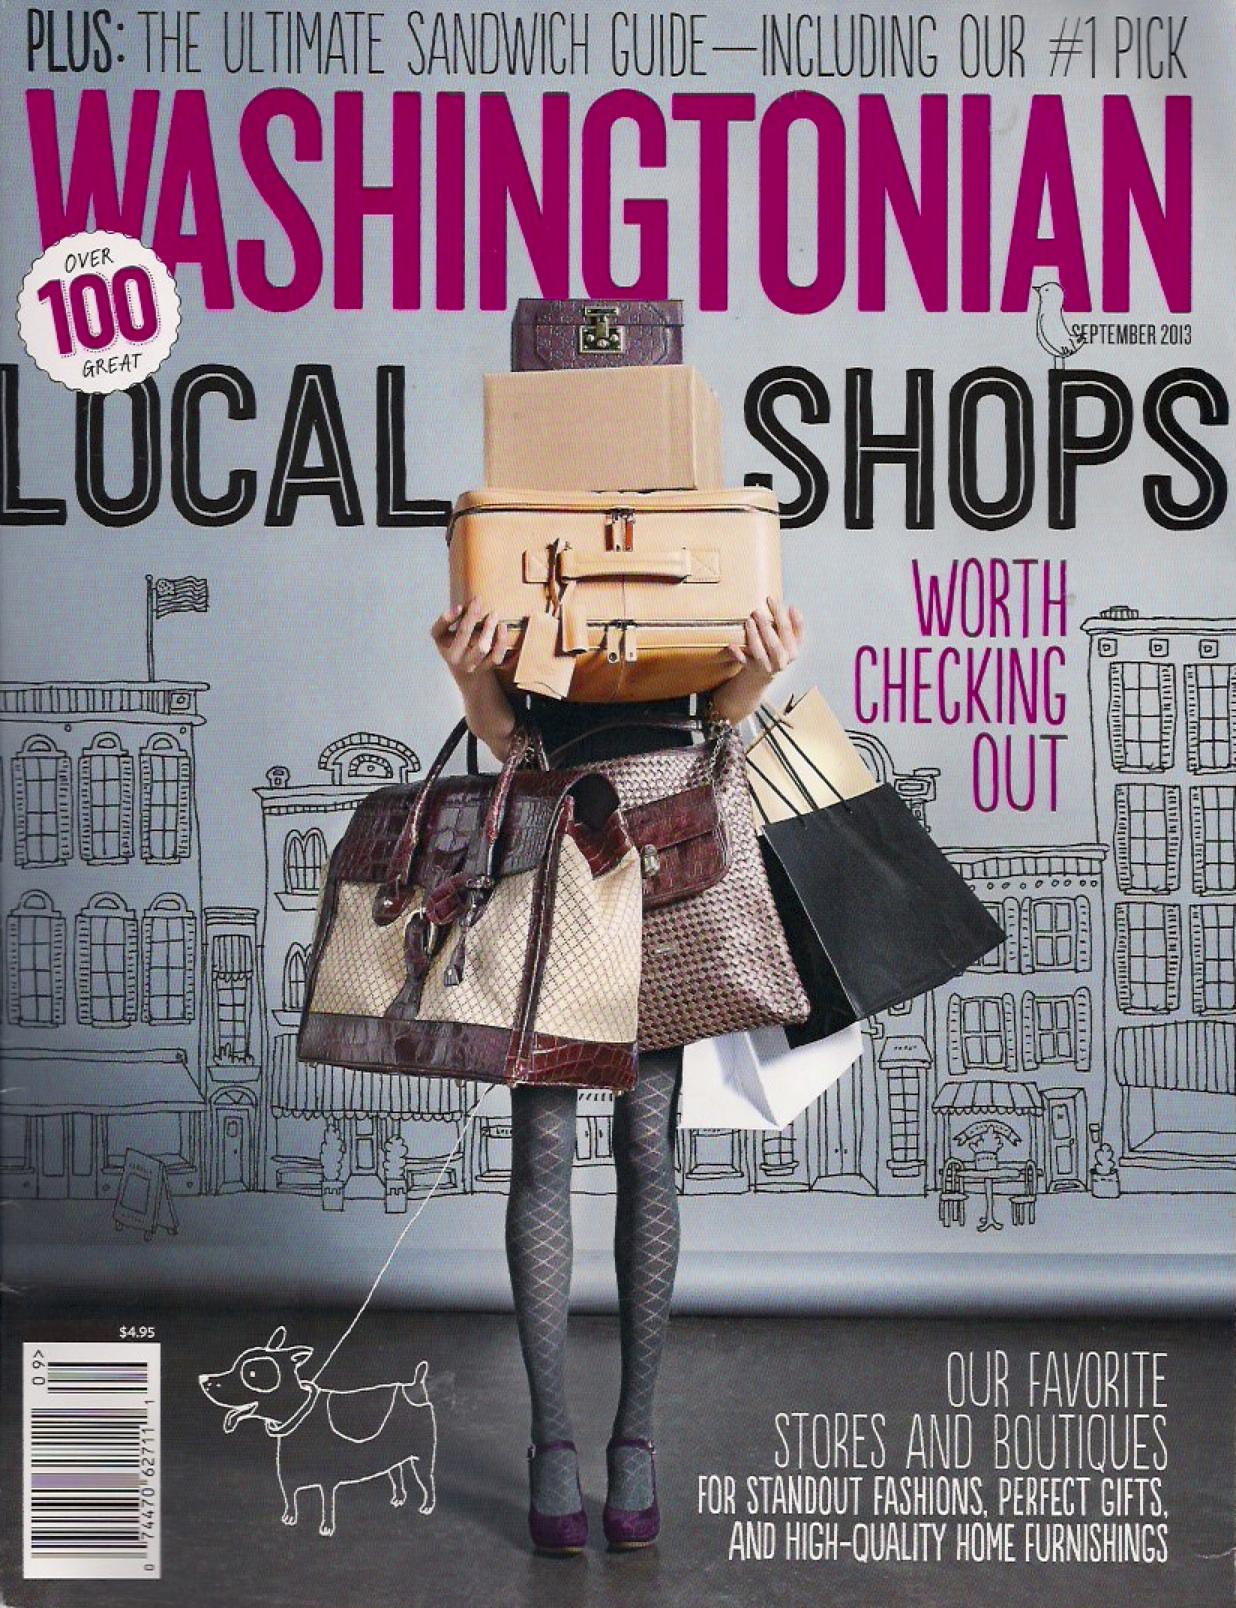 Washingtonian Sandwiches Page Cover 1